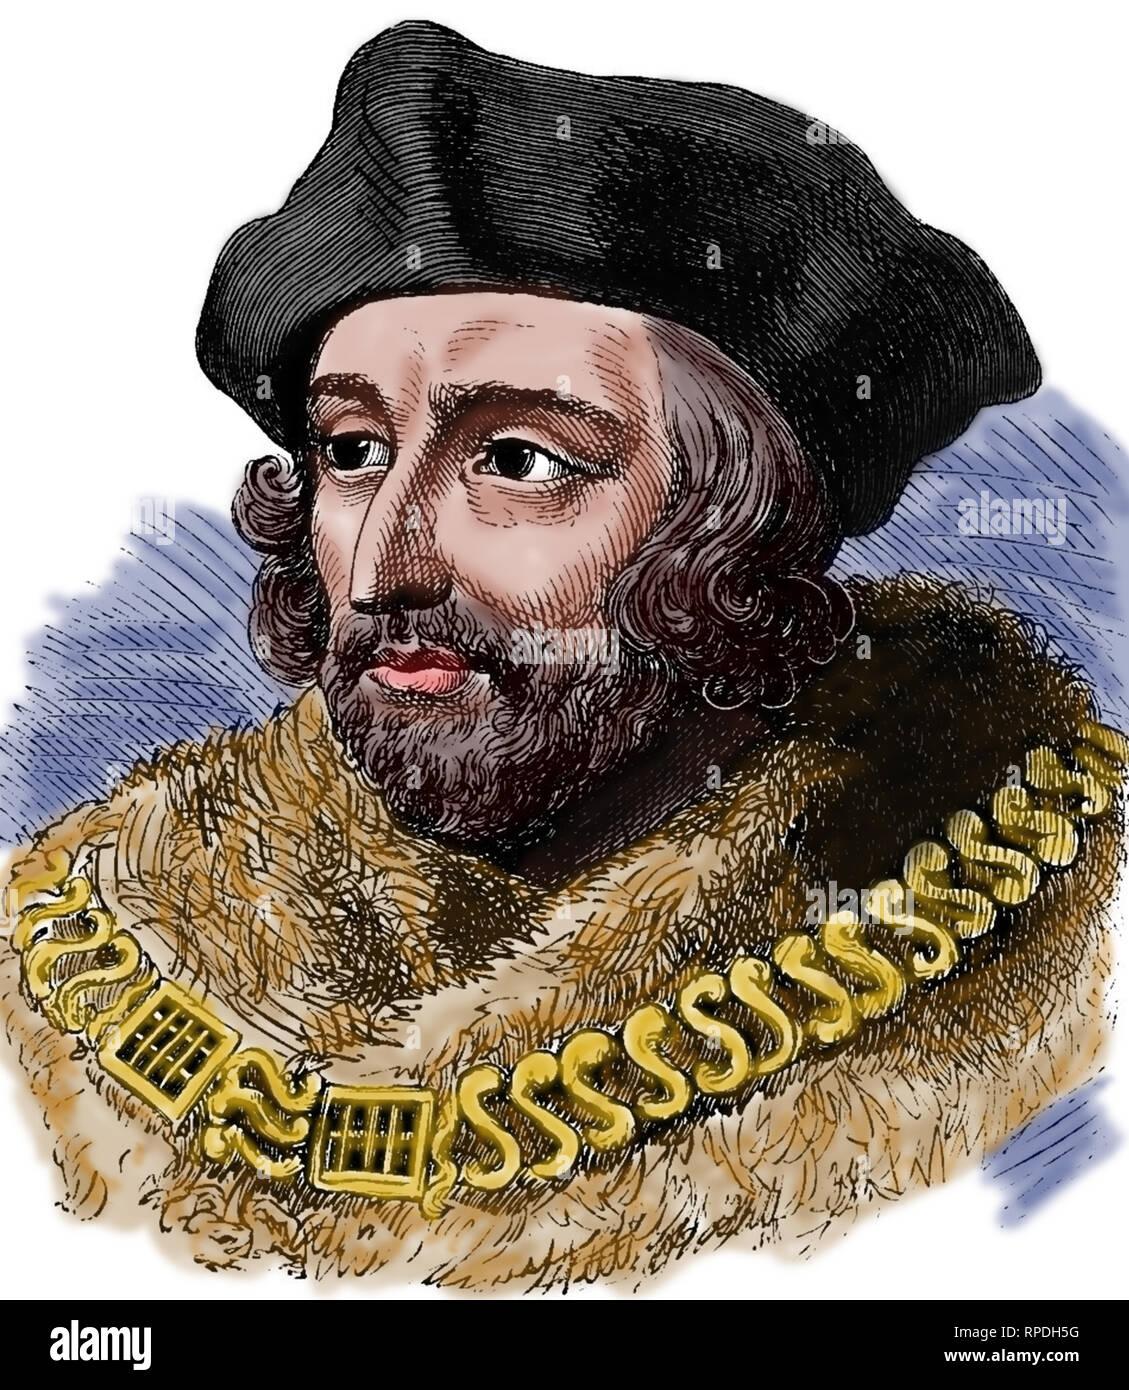 Thomas More (1478-1535). English lawyer. Social philosopher, statesman and Renaissance humanist. - Stock Image